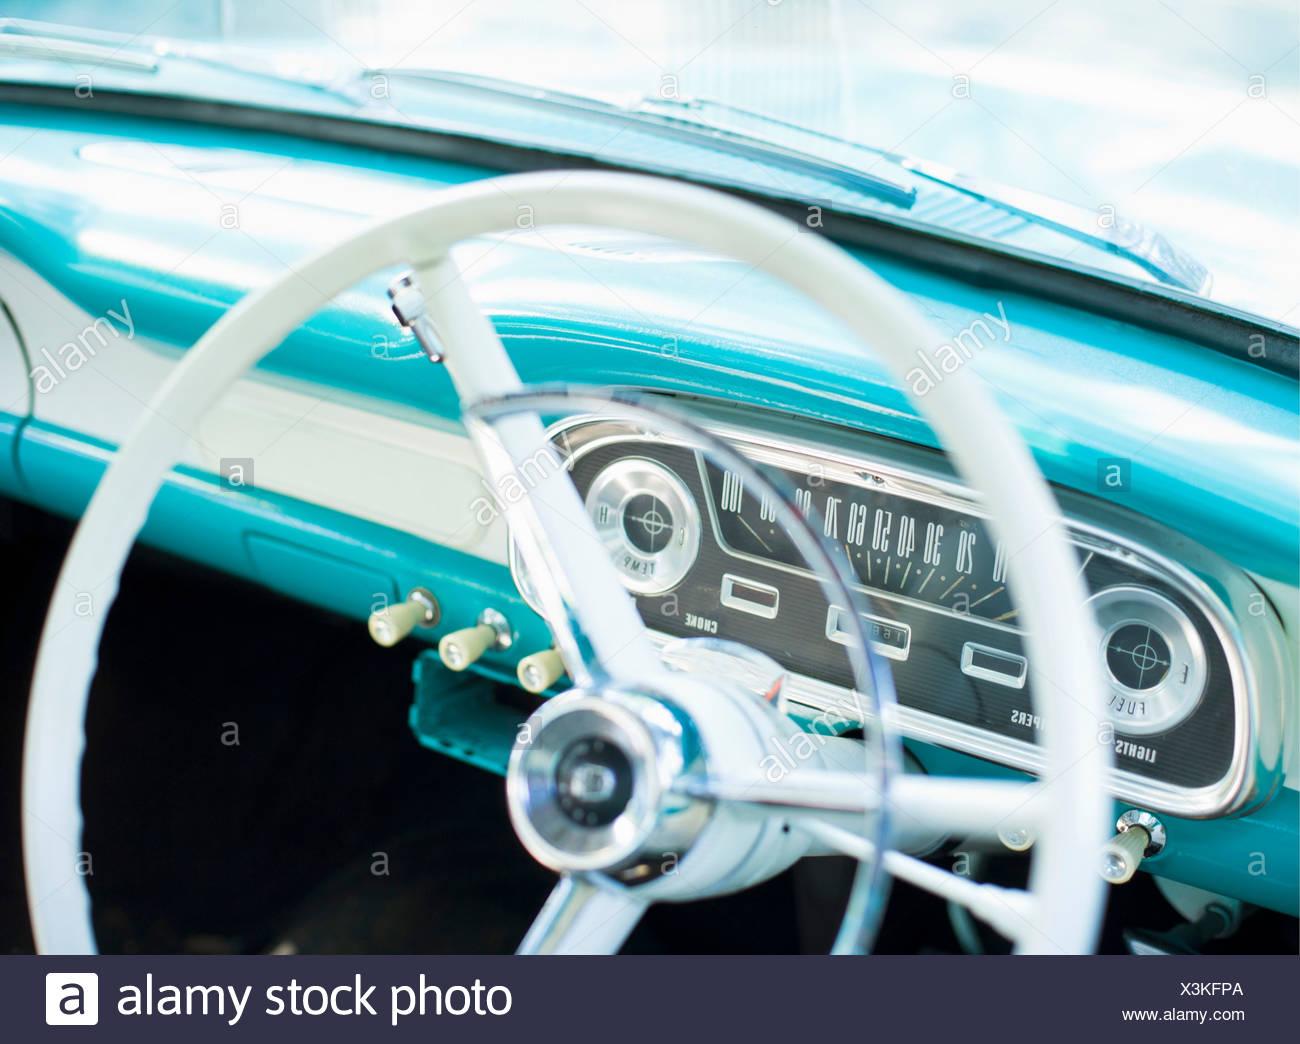 Steering wheel of classic American car - Stock Image